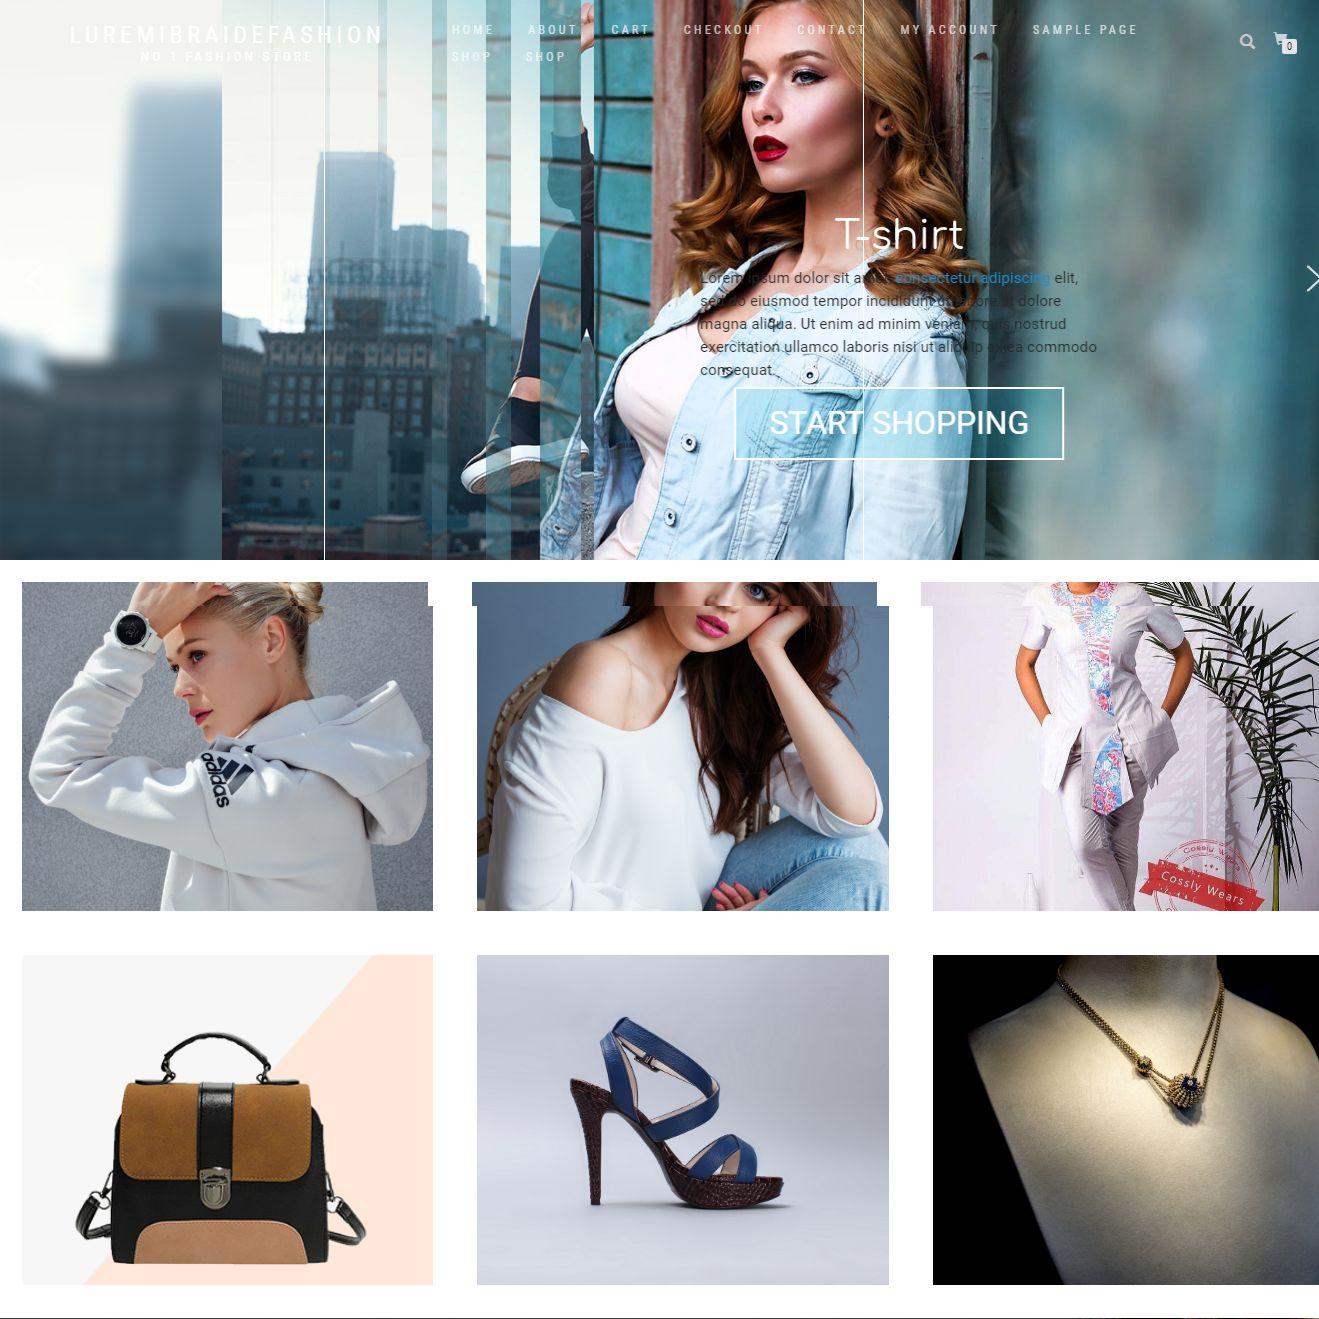 netface-luremi-fashion-store